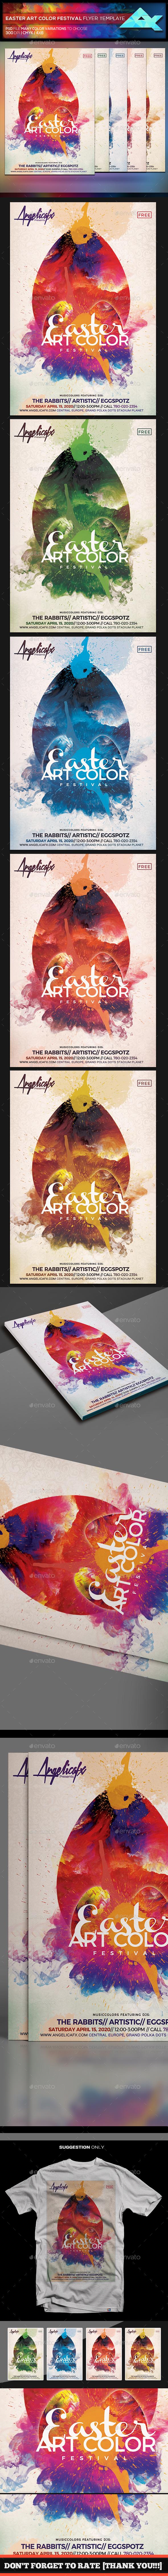 Easter Art Color Festival Flyer Template - Flyers Print Templates